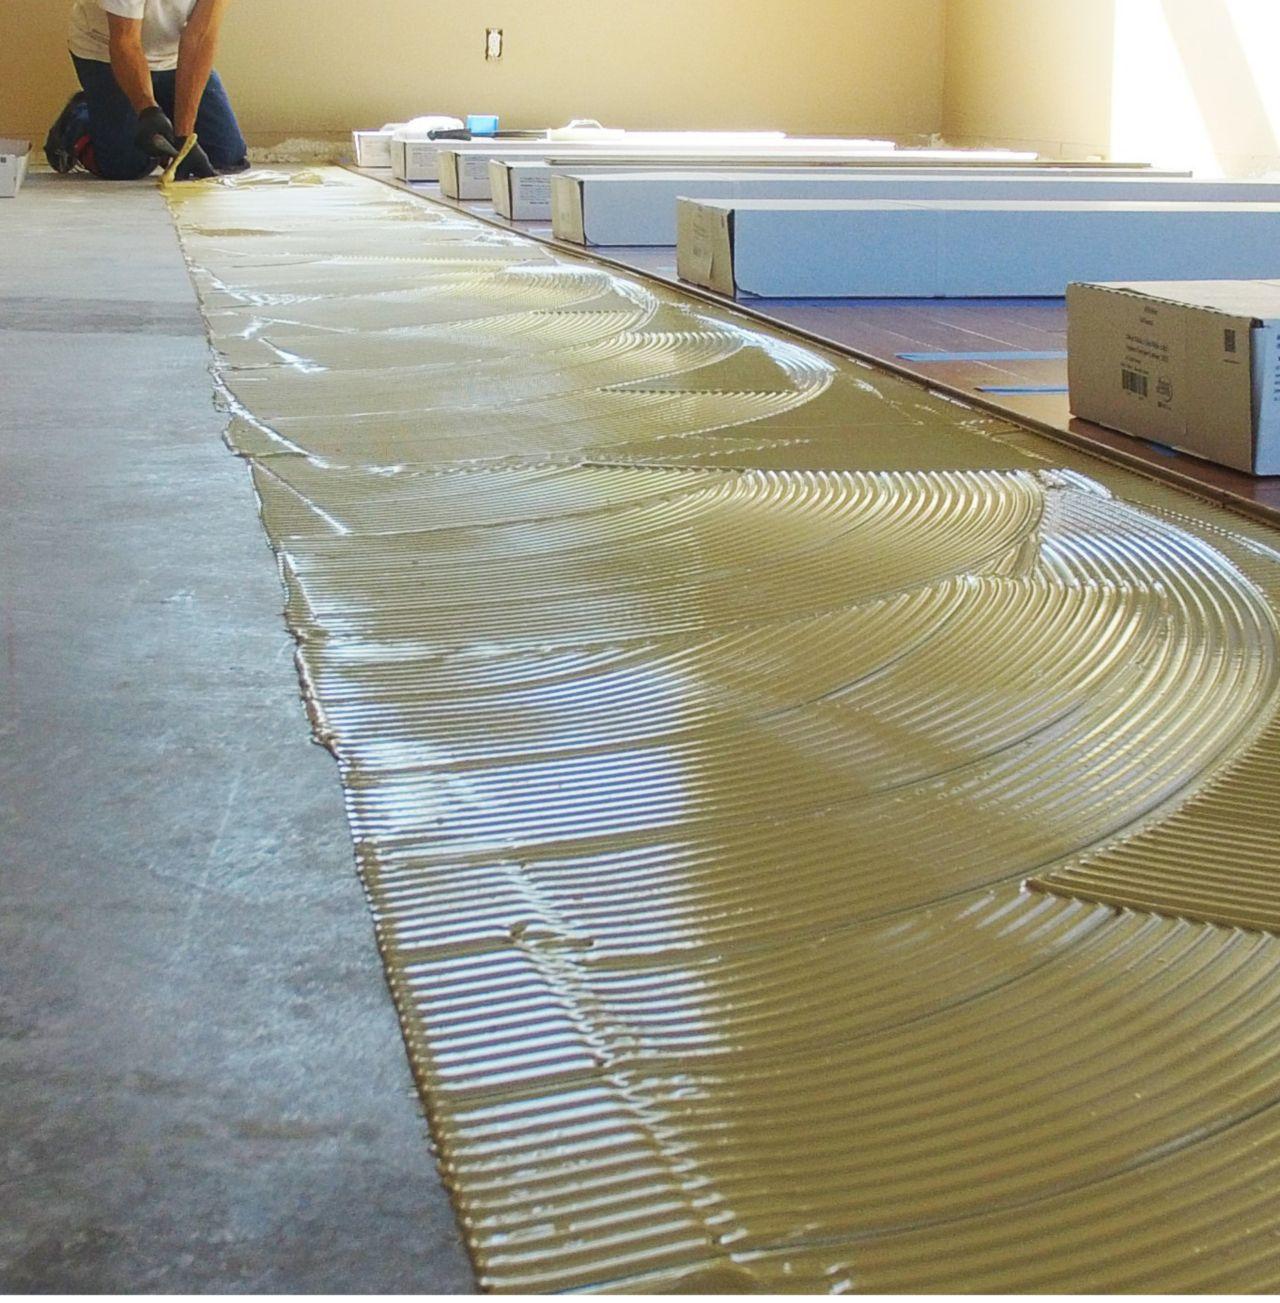 sikabond floor adhesive